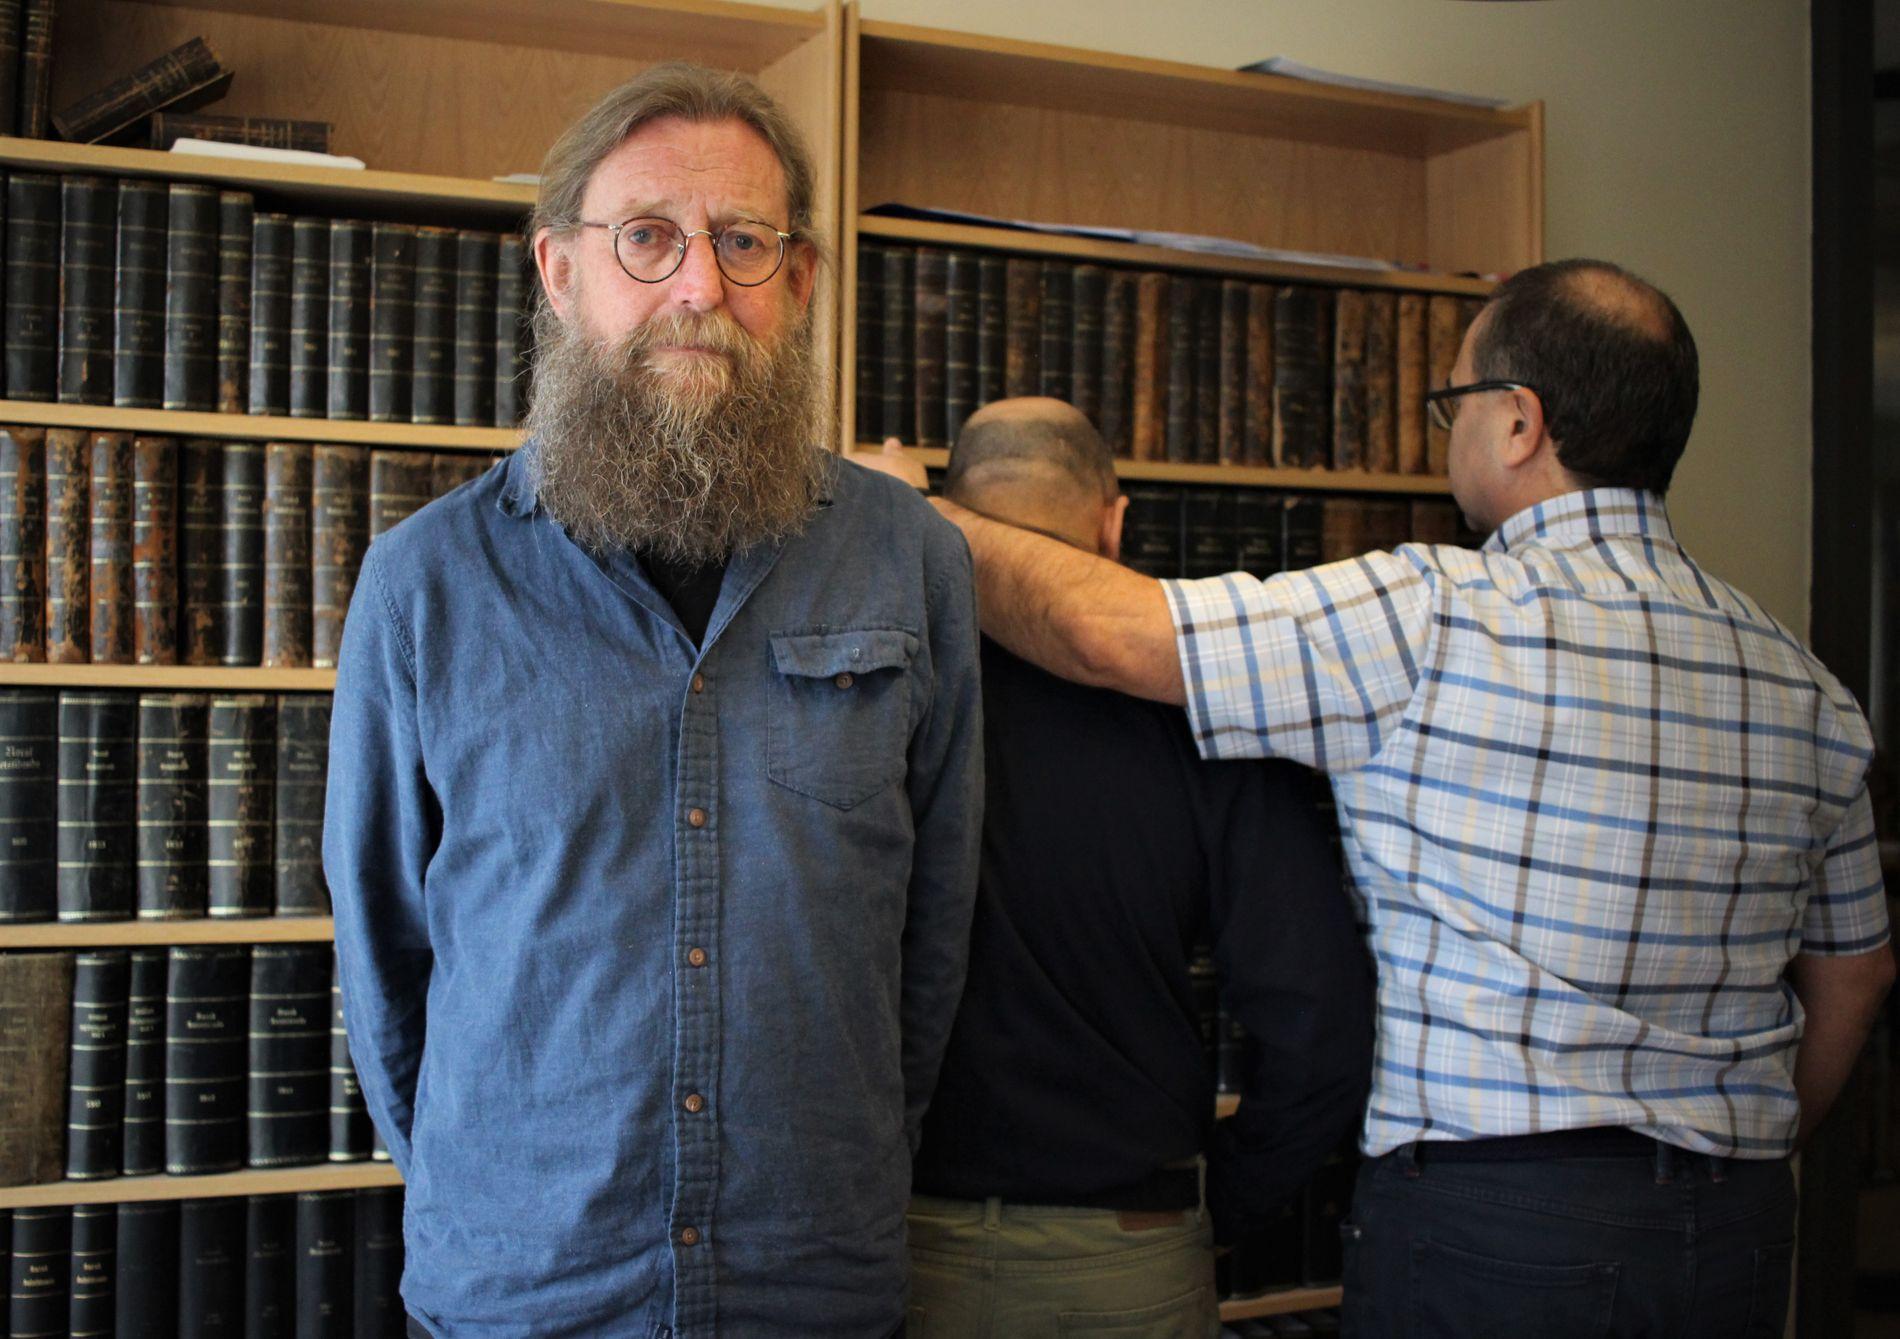 STØTTER HVERANDRE: De to bestefedrene får hjelp hos advokat Bjørn Nærum i Skien, men har ikke fått bistand fra UD.